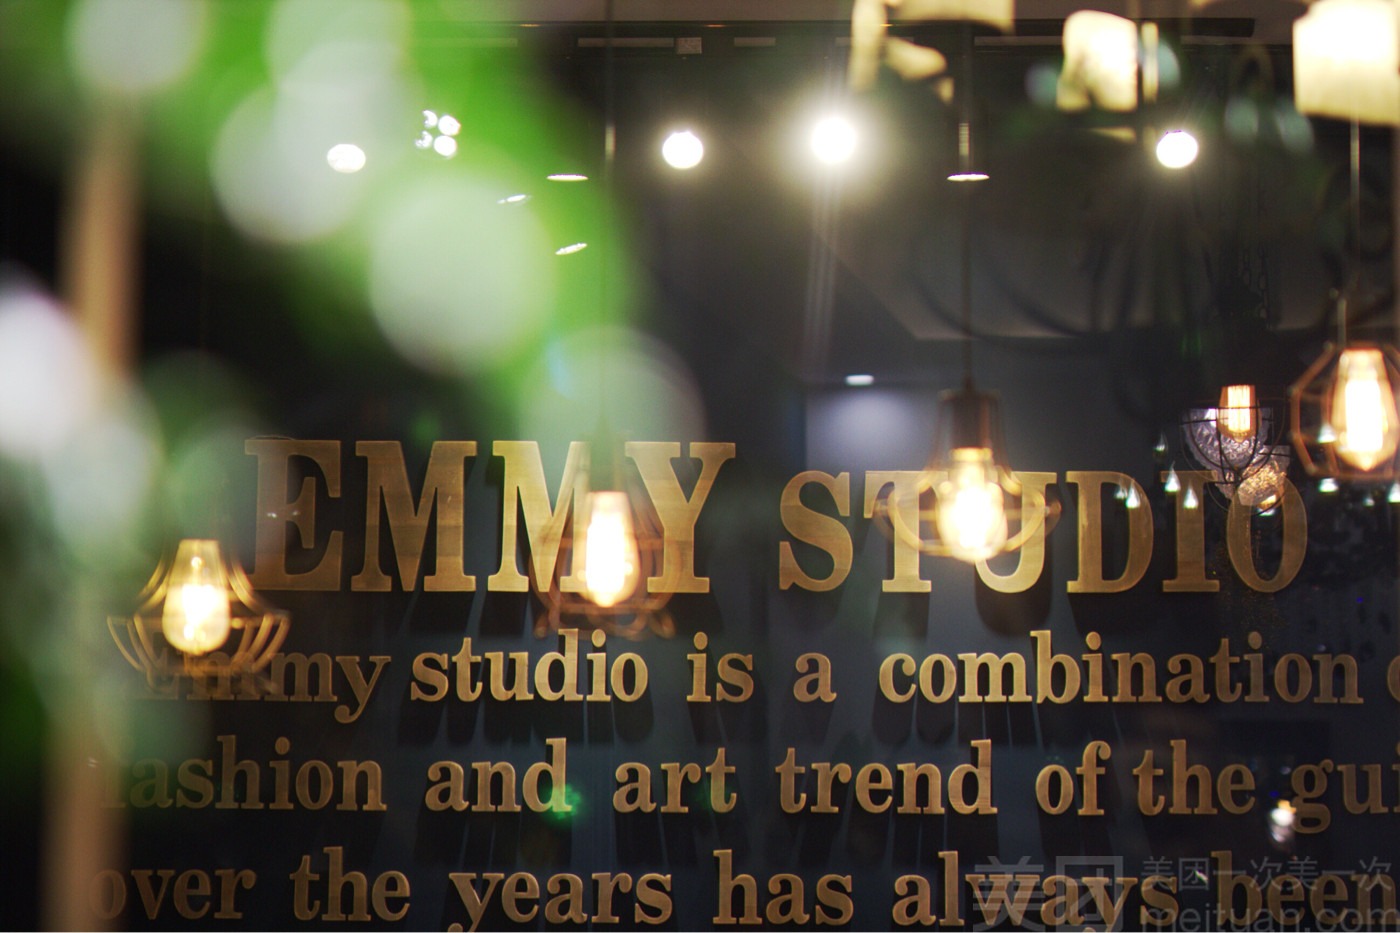 EMMY Hair salon艾美潮流沙龙-美团